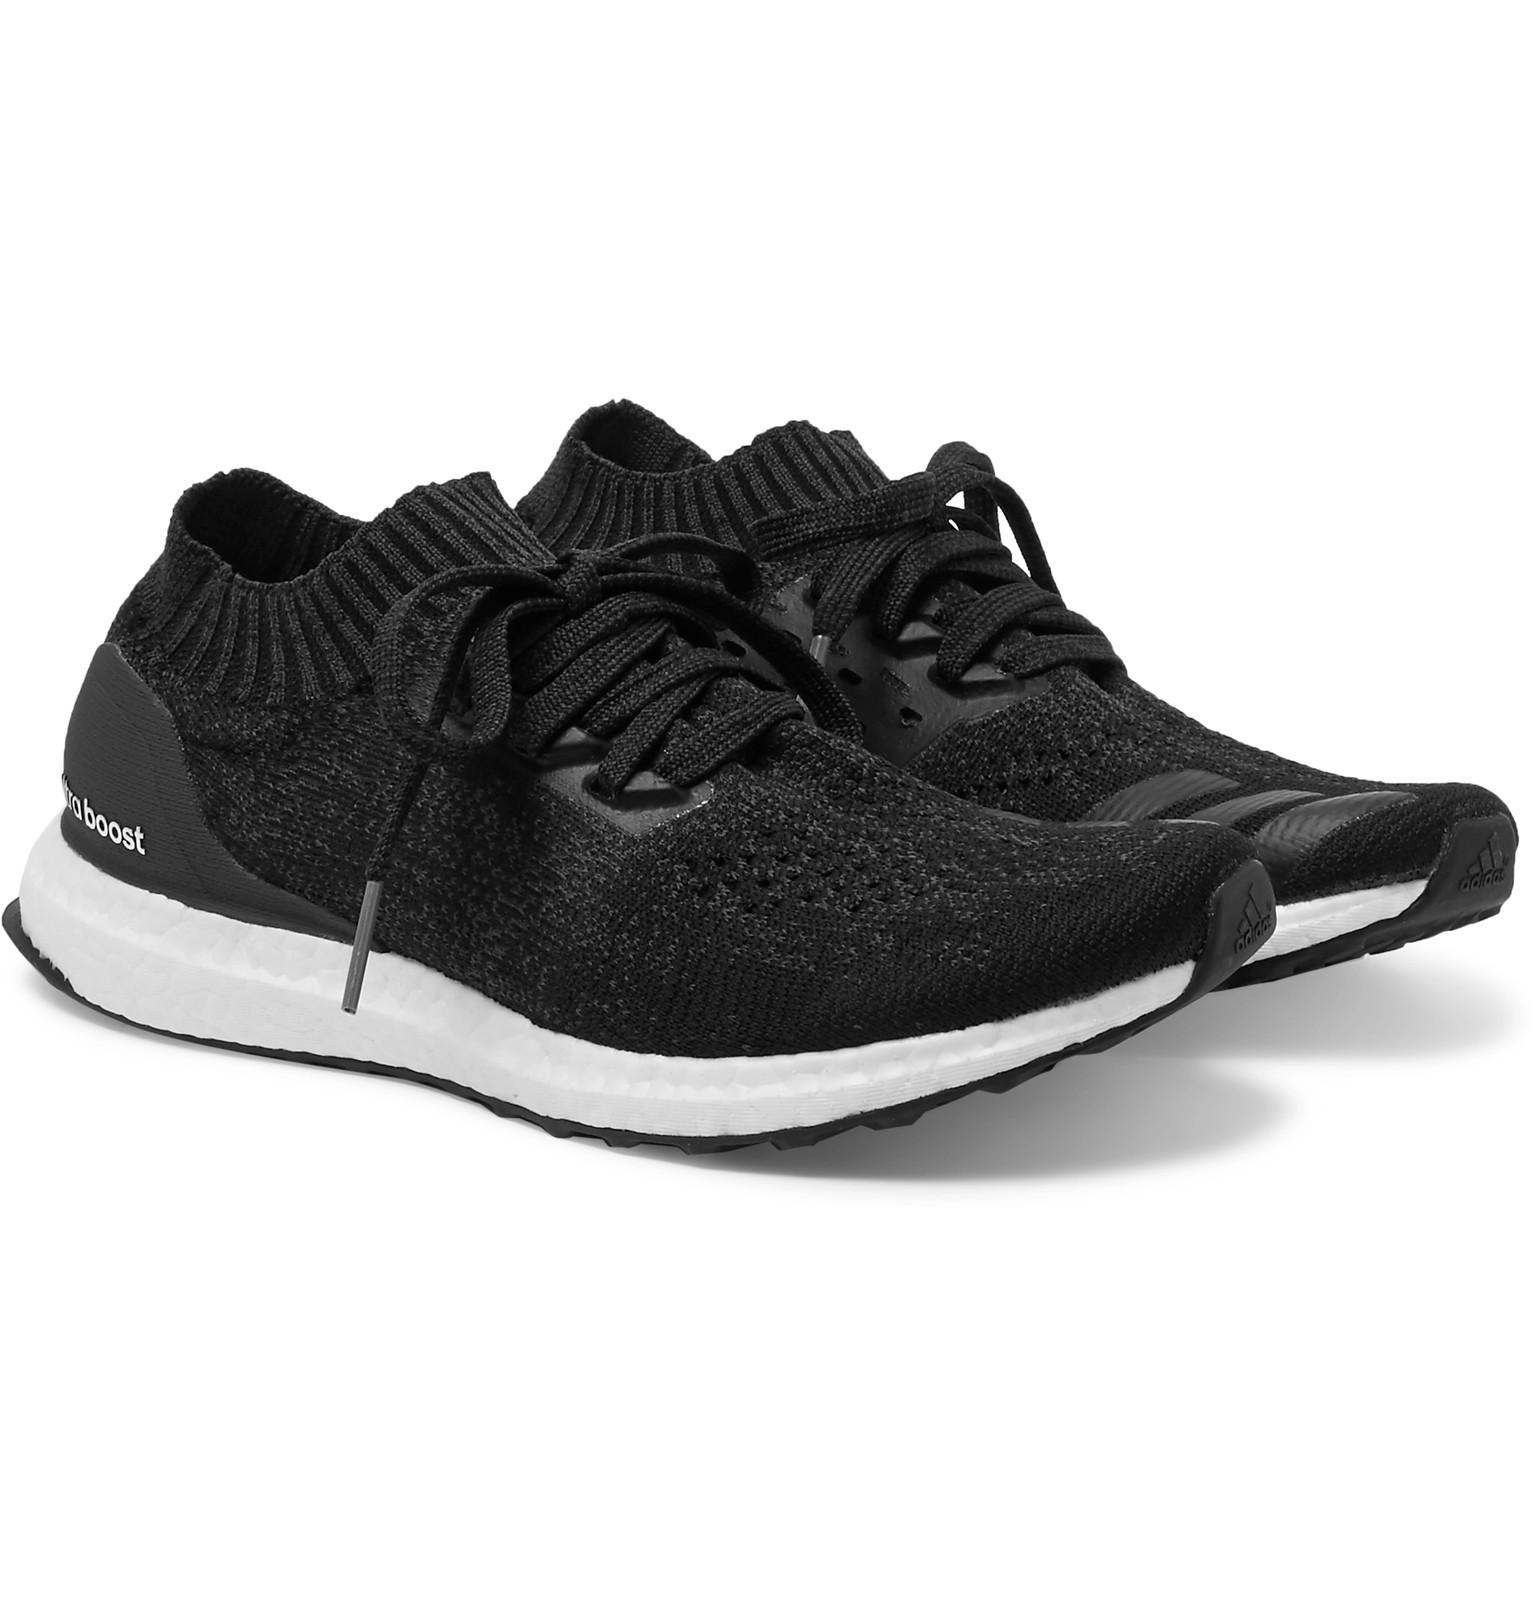 Adidas Originali Ultra Impulso Senza Freni M É Lange Primeknit Scarpe da Ginnastica In